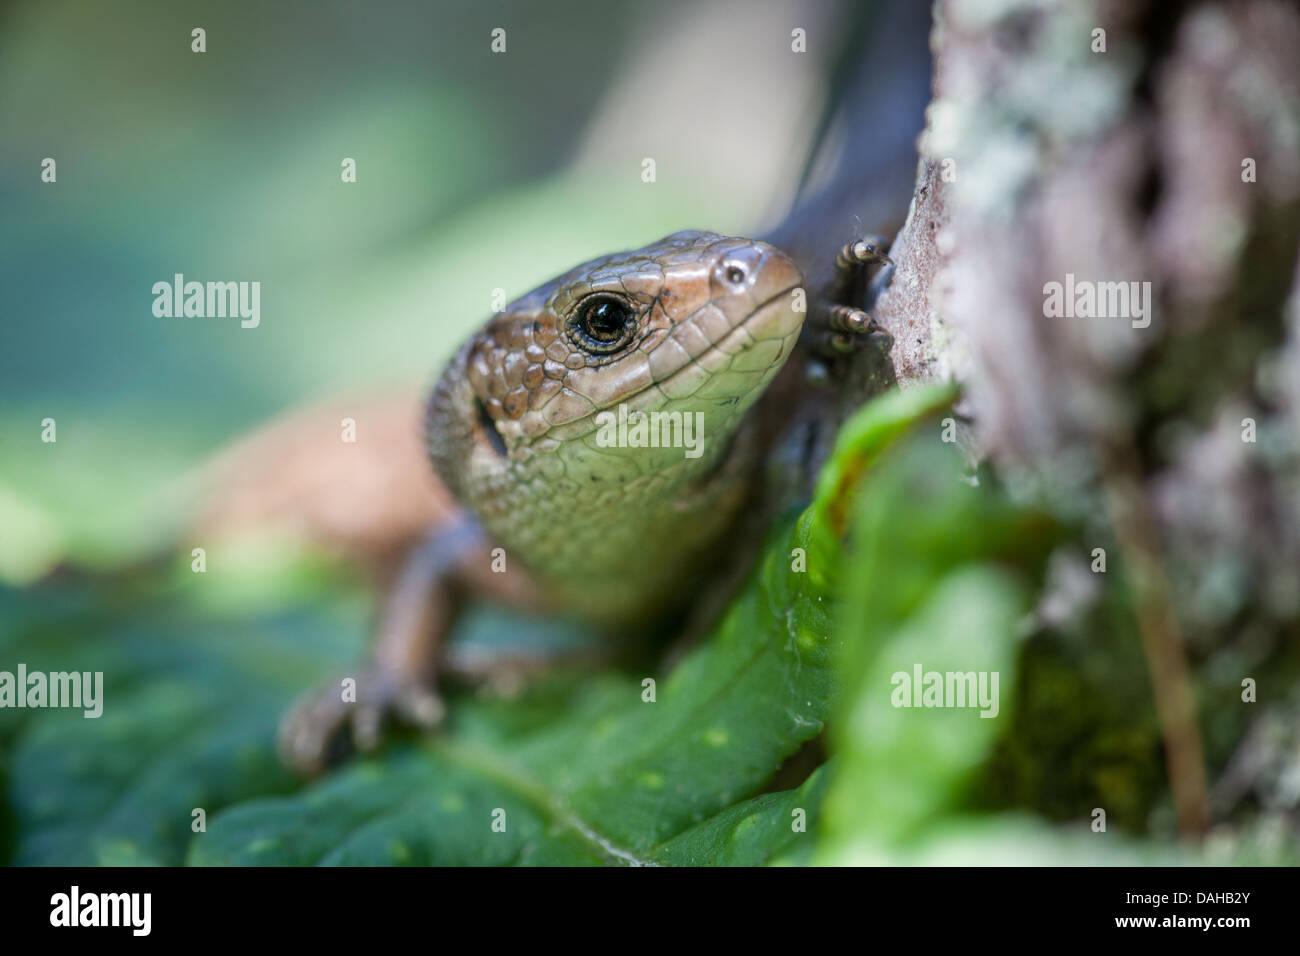 Viviparous lizard, Zootoca vivipara, at Larkollen in Rygge kommune, Østfold fylke, Norway. - Stock Image